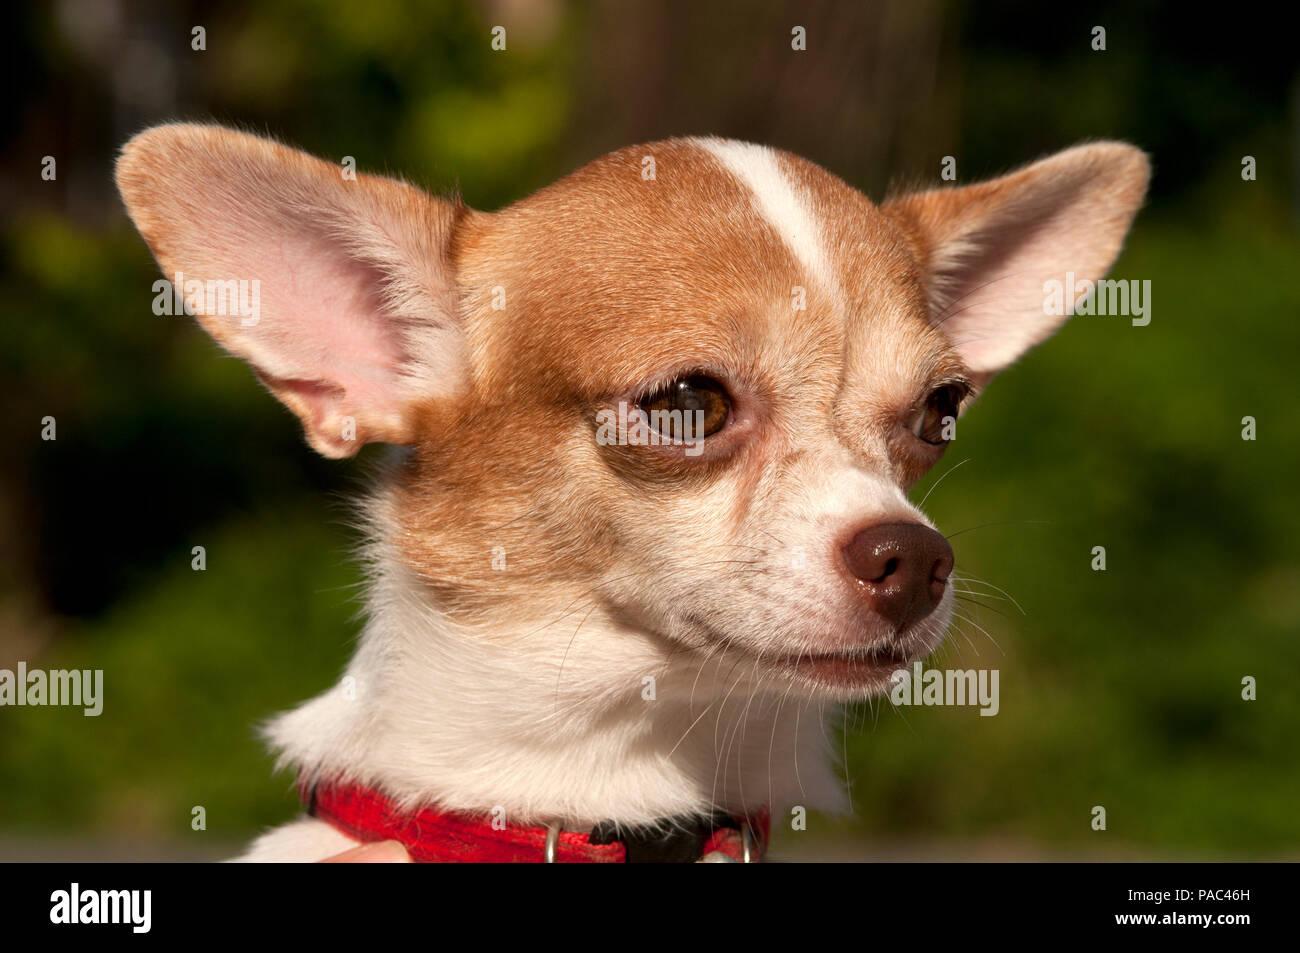 Chihuahua - Portrait - Canis familiaris - Stock Image